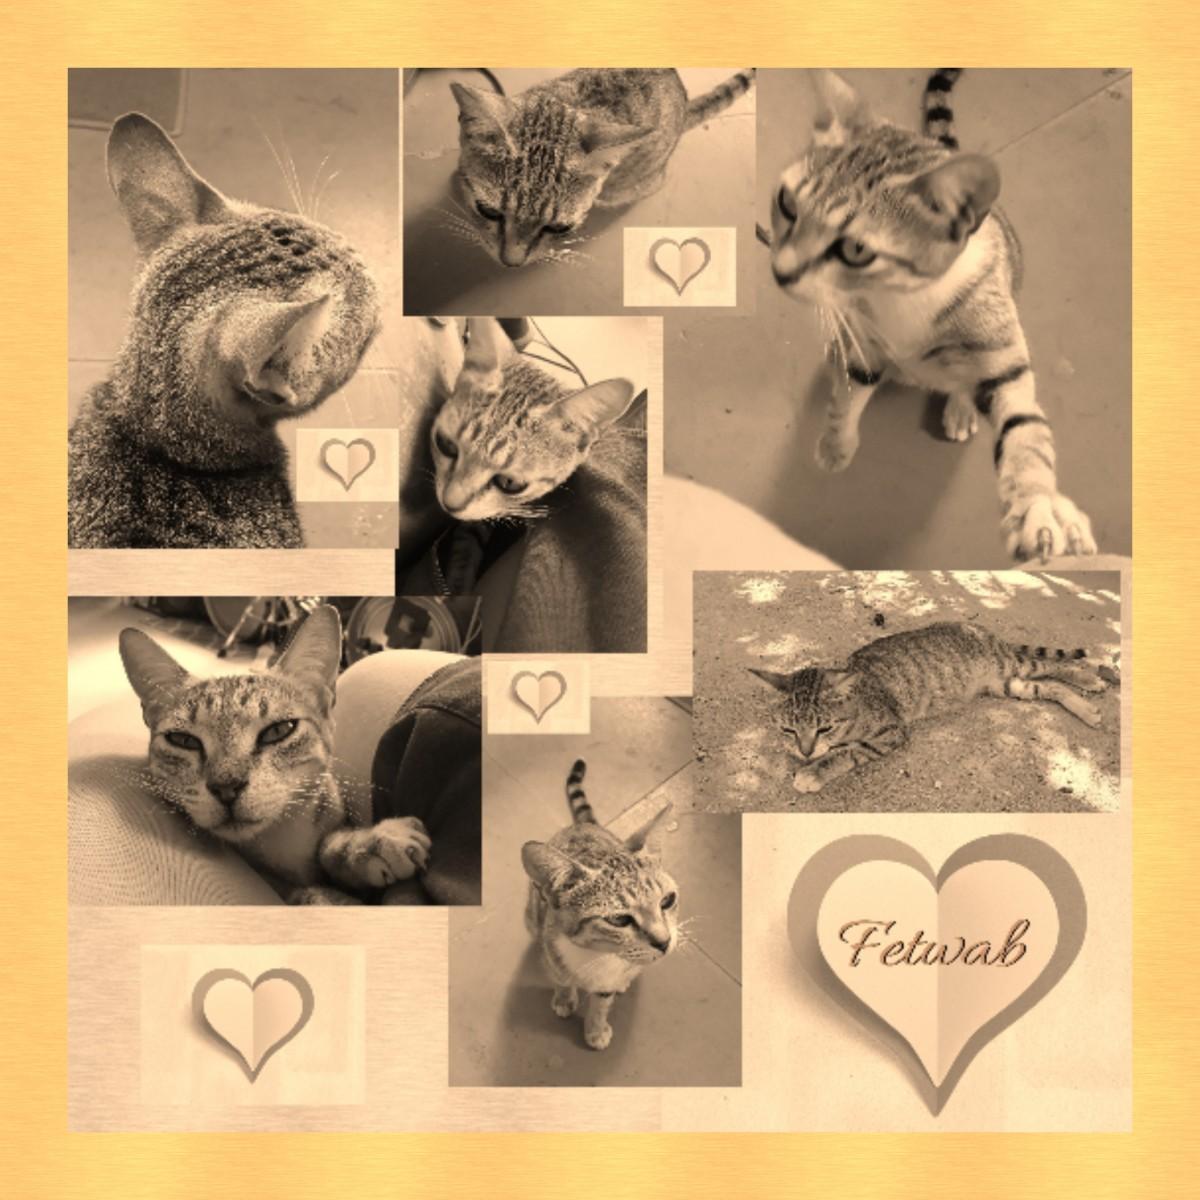 FETWAB the Kitty - A Poem